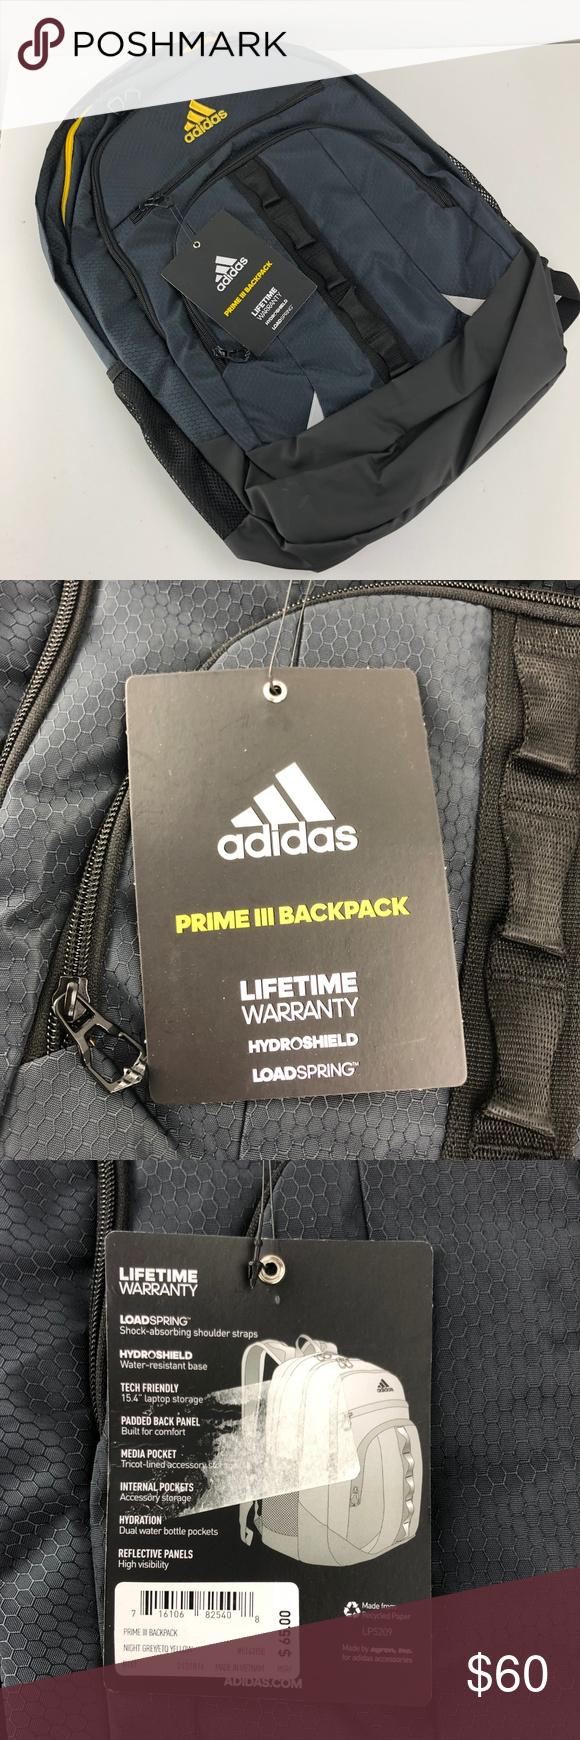 Adidas Prime III Backpack Black Yellow NEW NEW With Tags Adidas Prime III  Backpack Black Yellow 50ef5159216b3